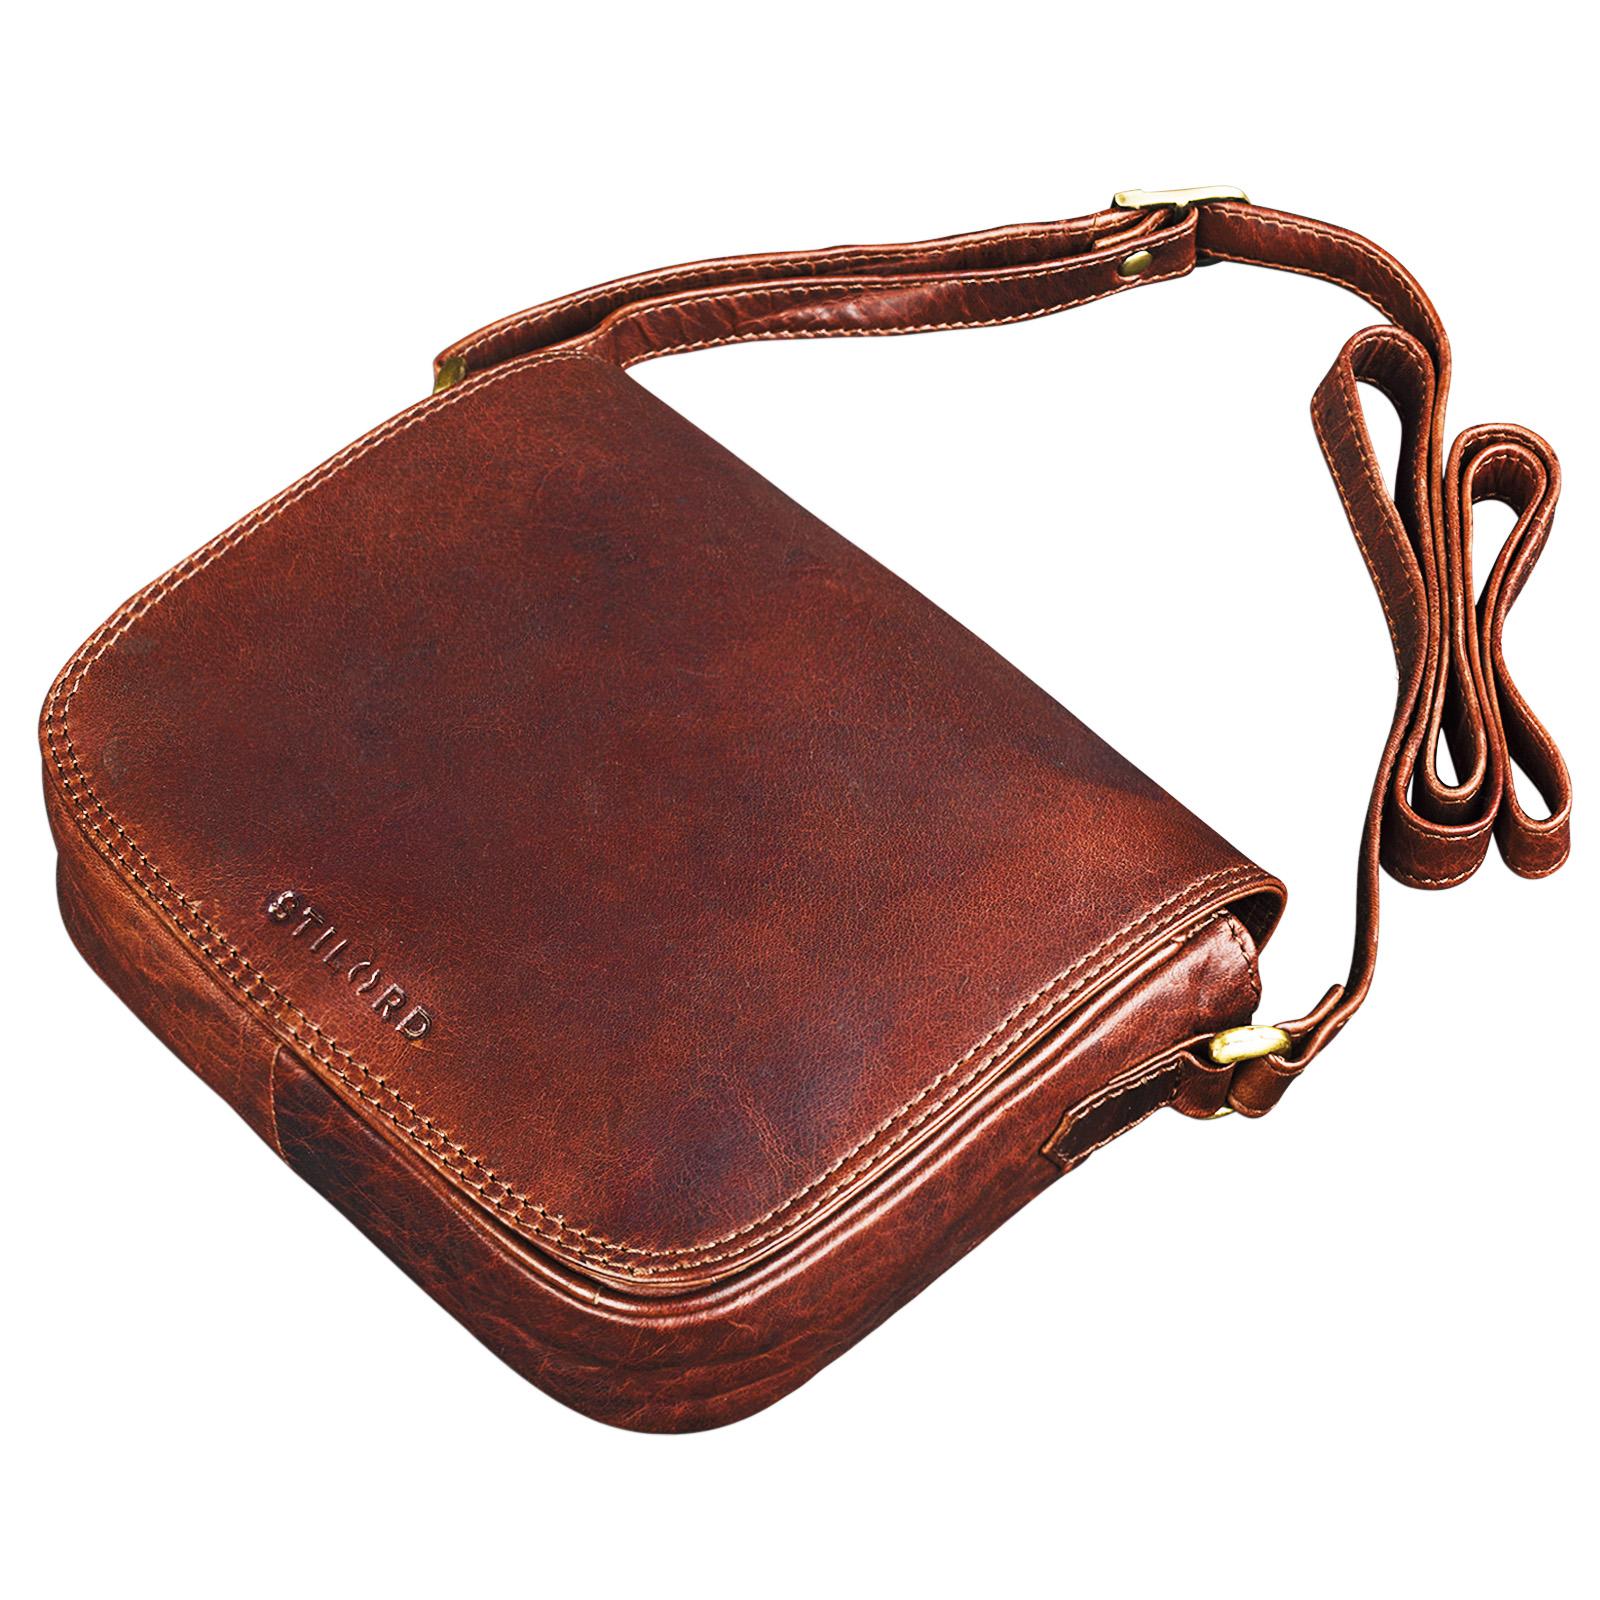 Handtasche small Leder braun